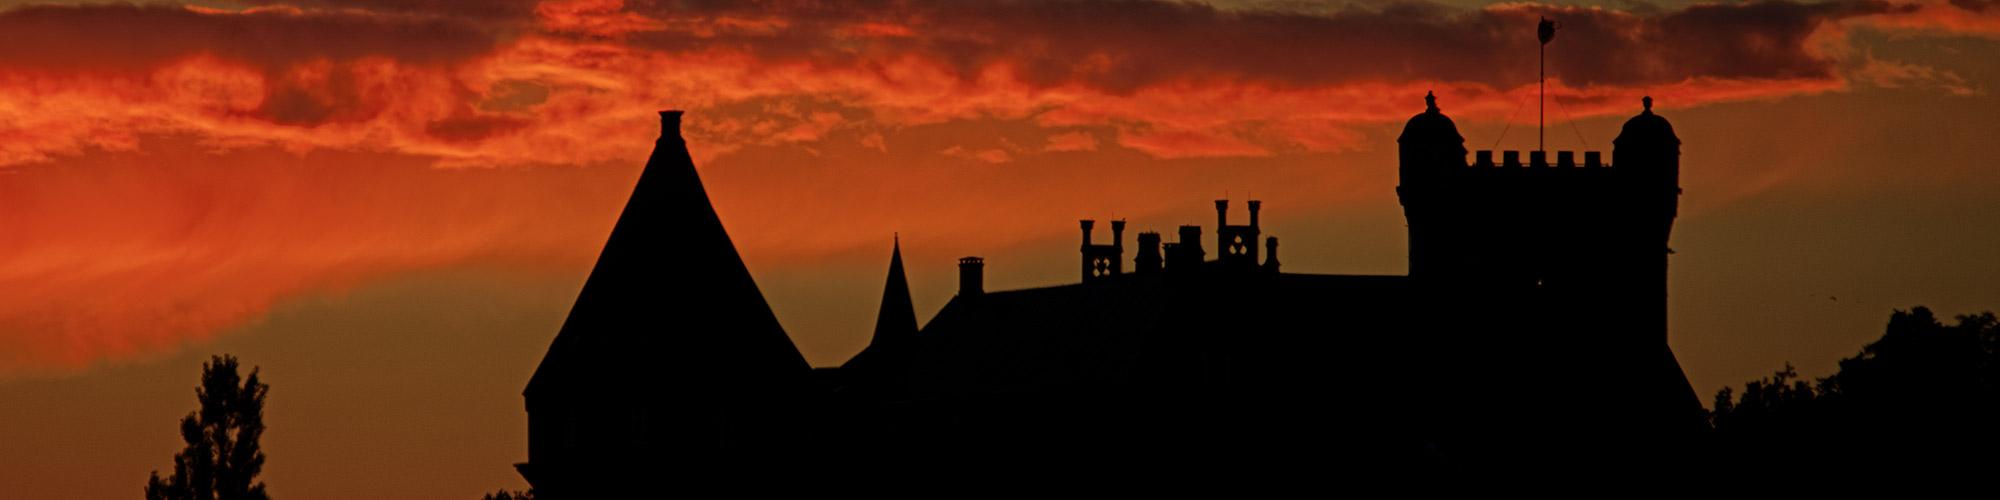 Burg Bentheim im Abendrot